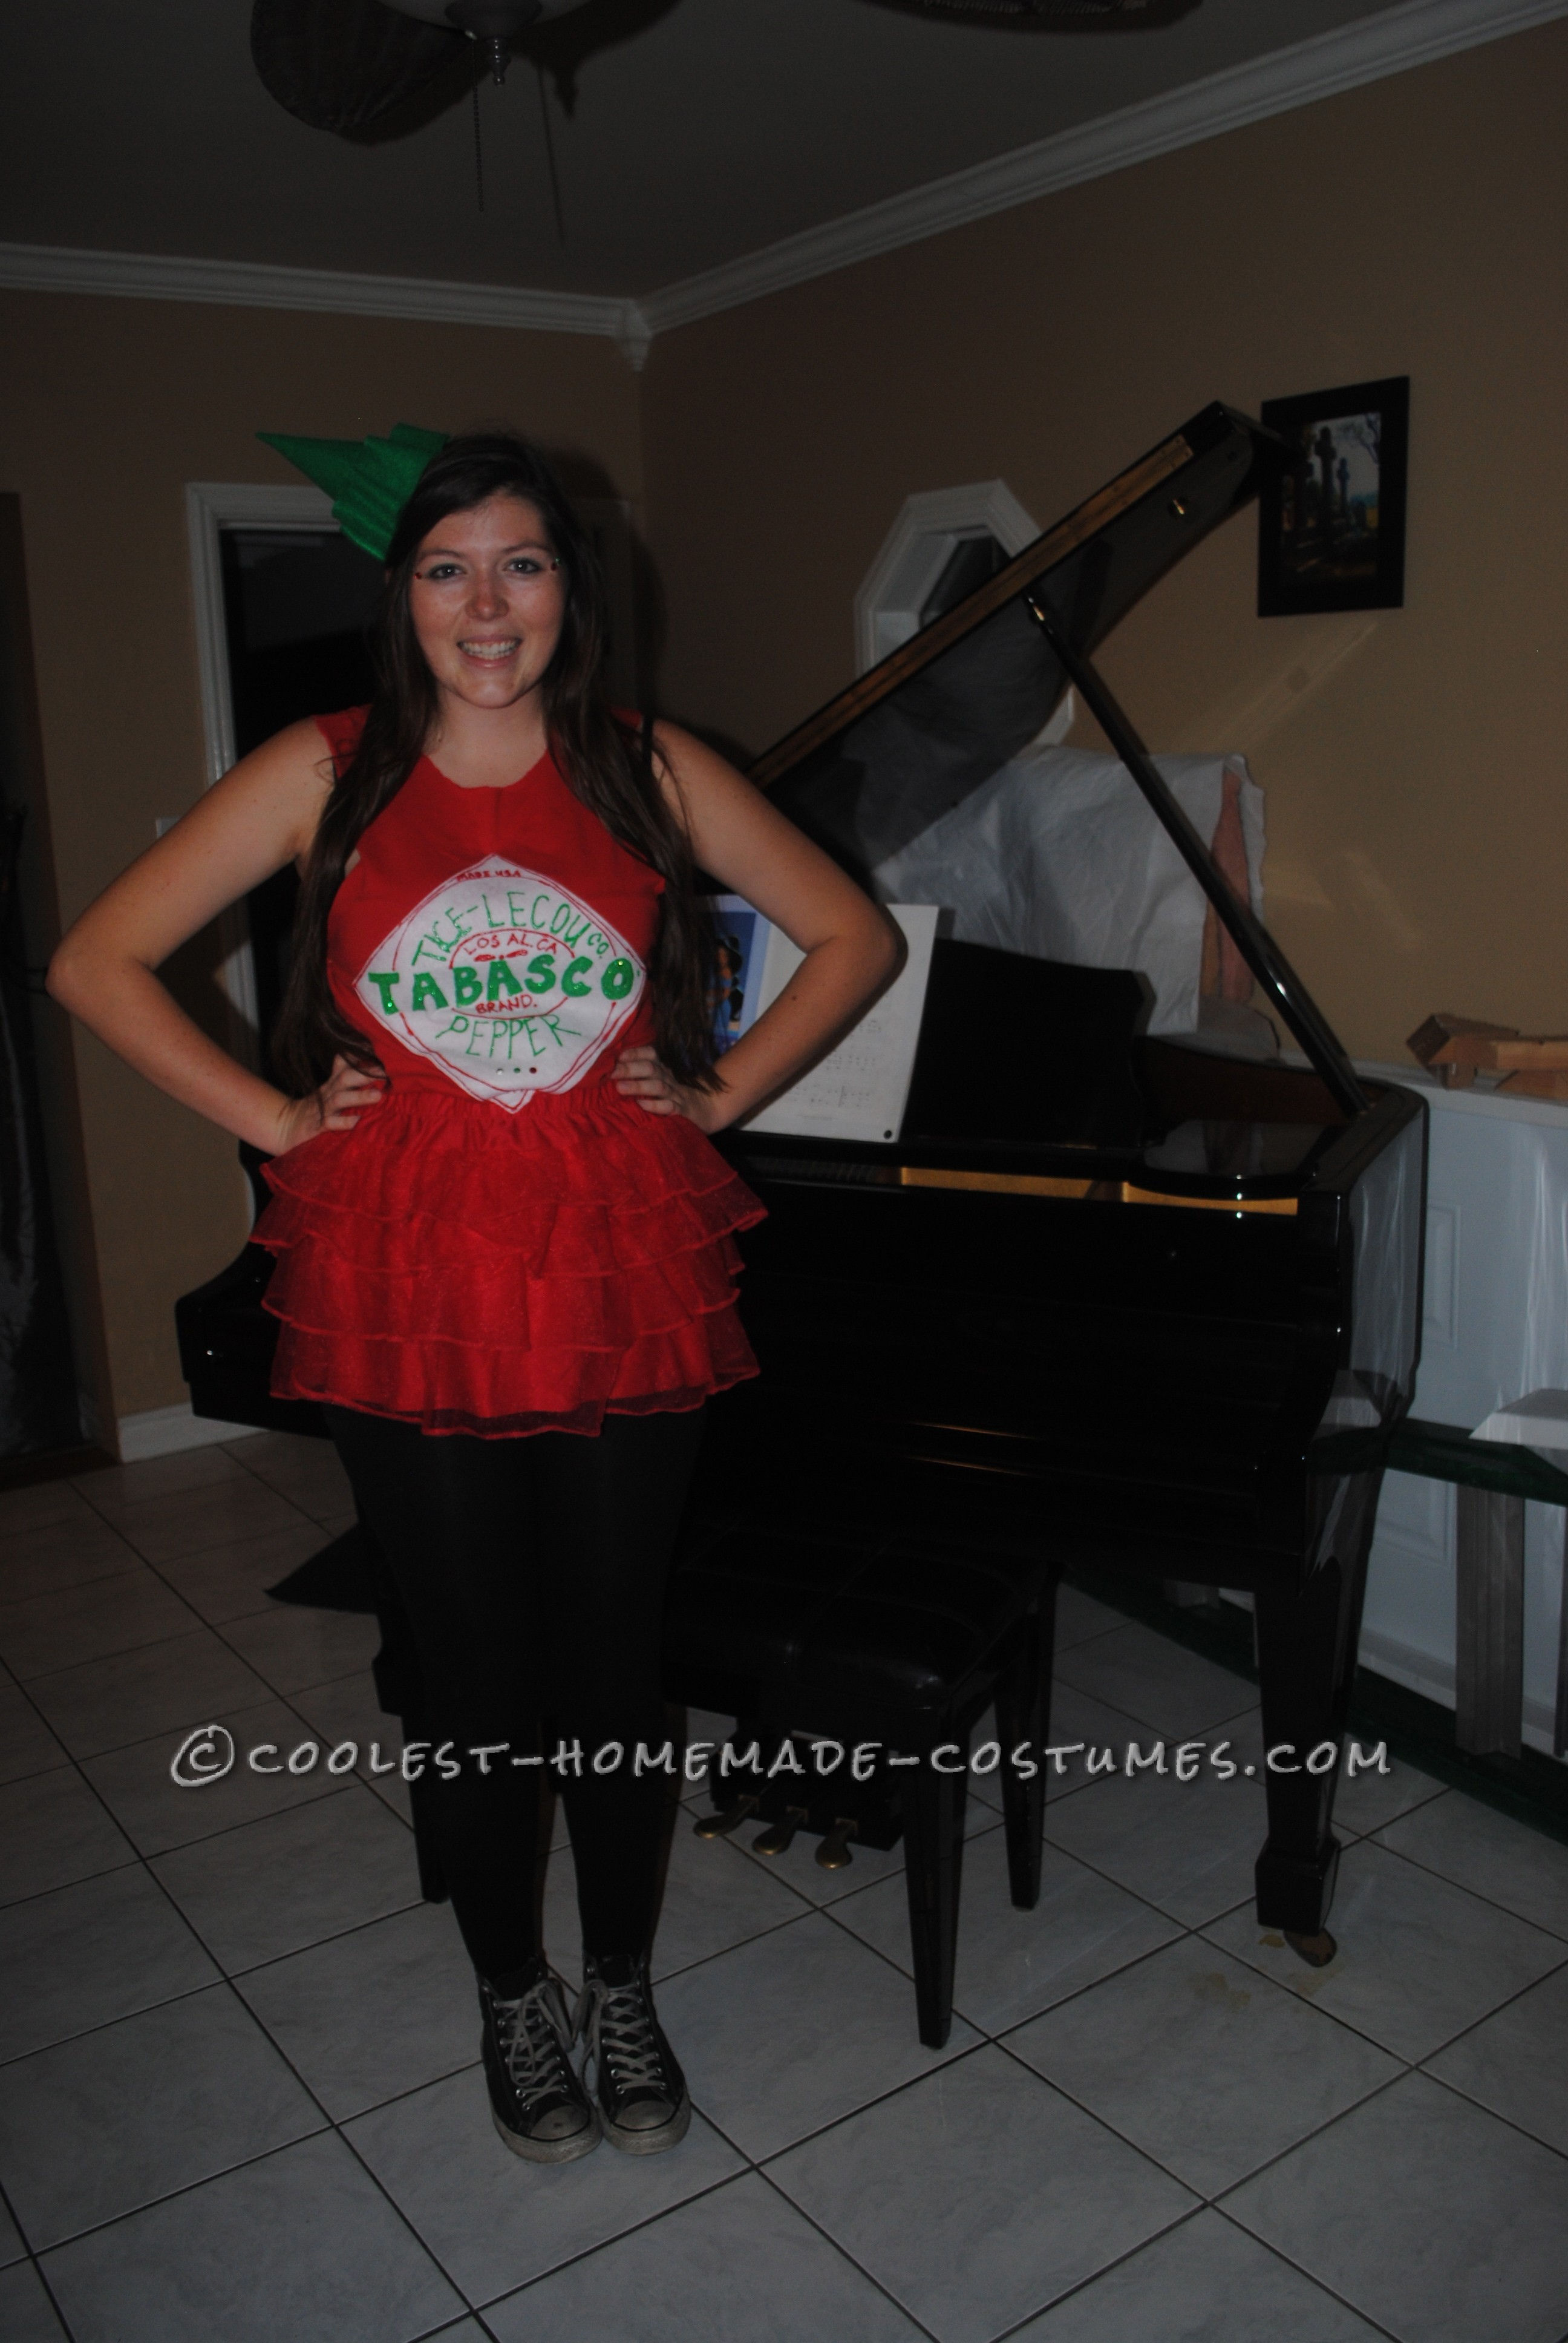 Easy Girly Tabasco Costume - Keeping it Hot!